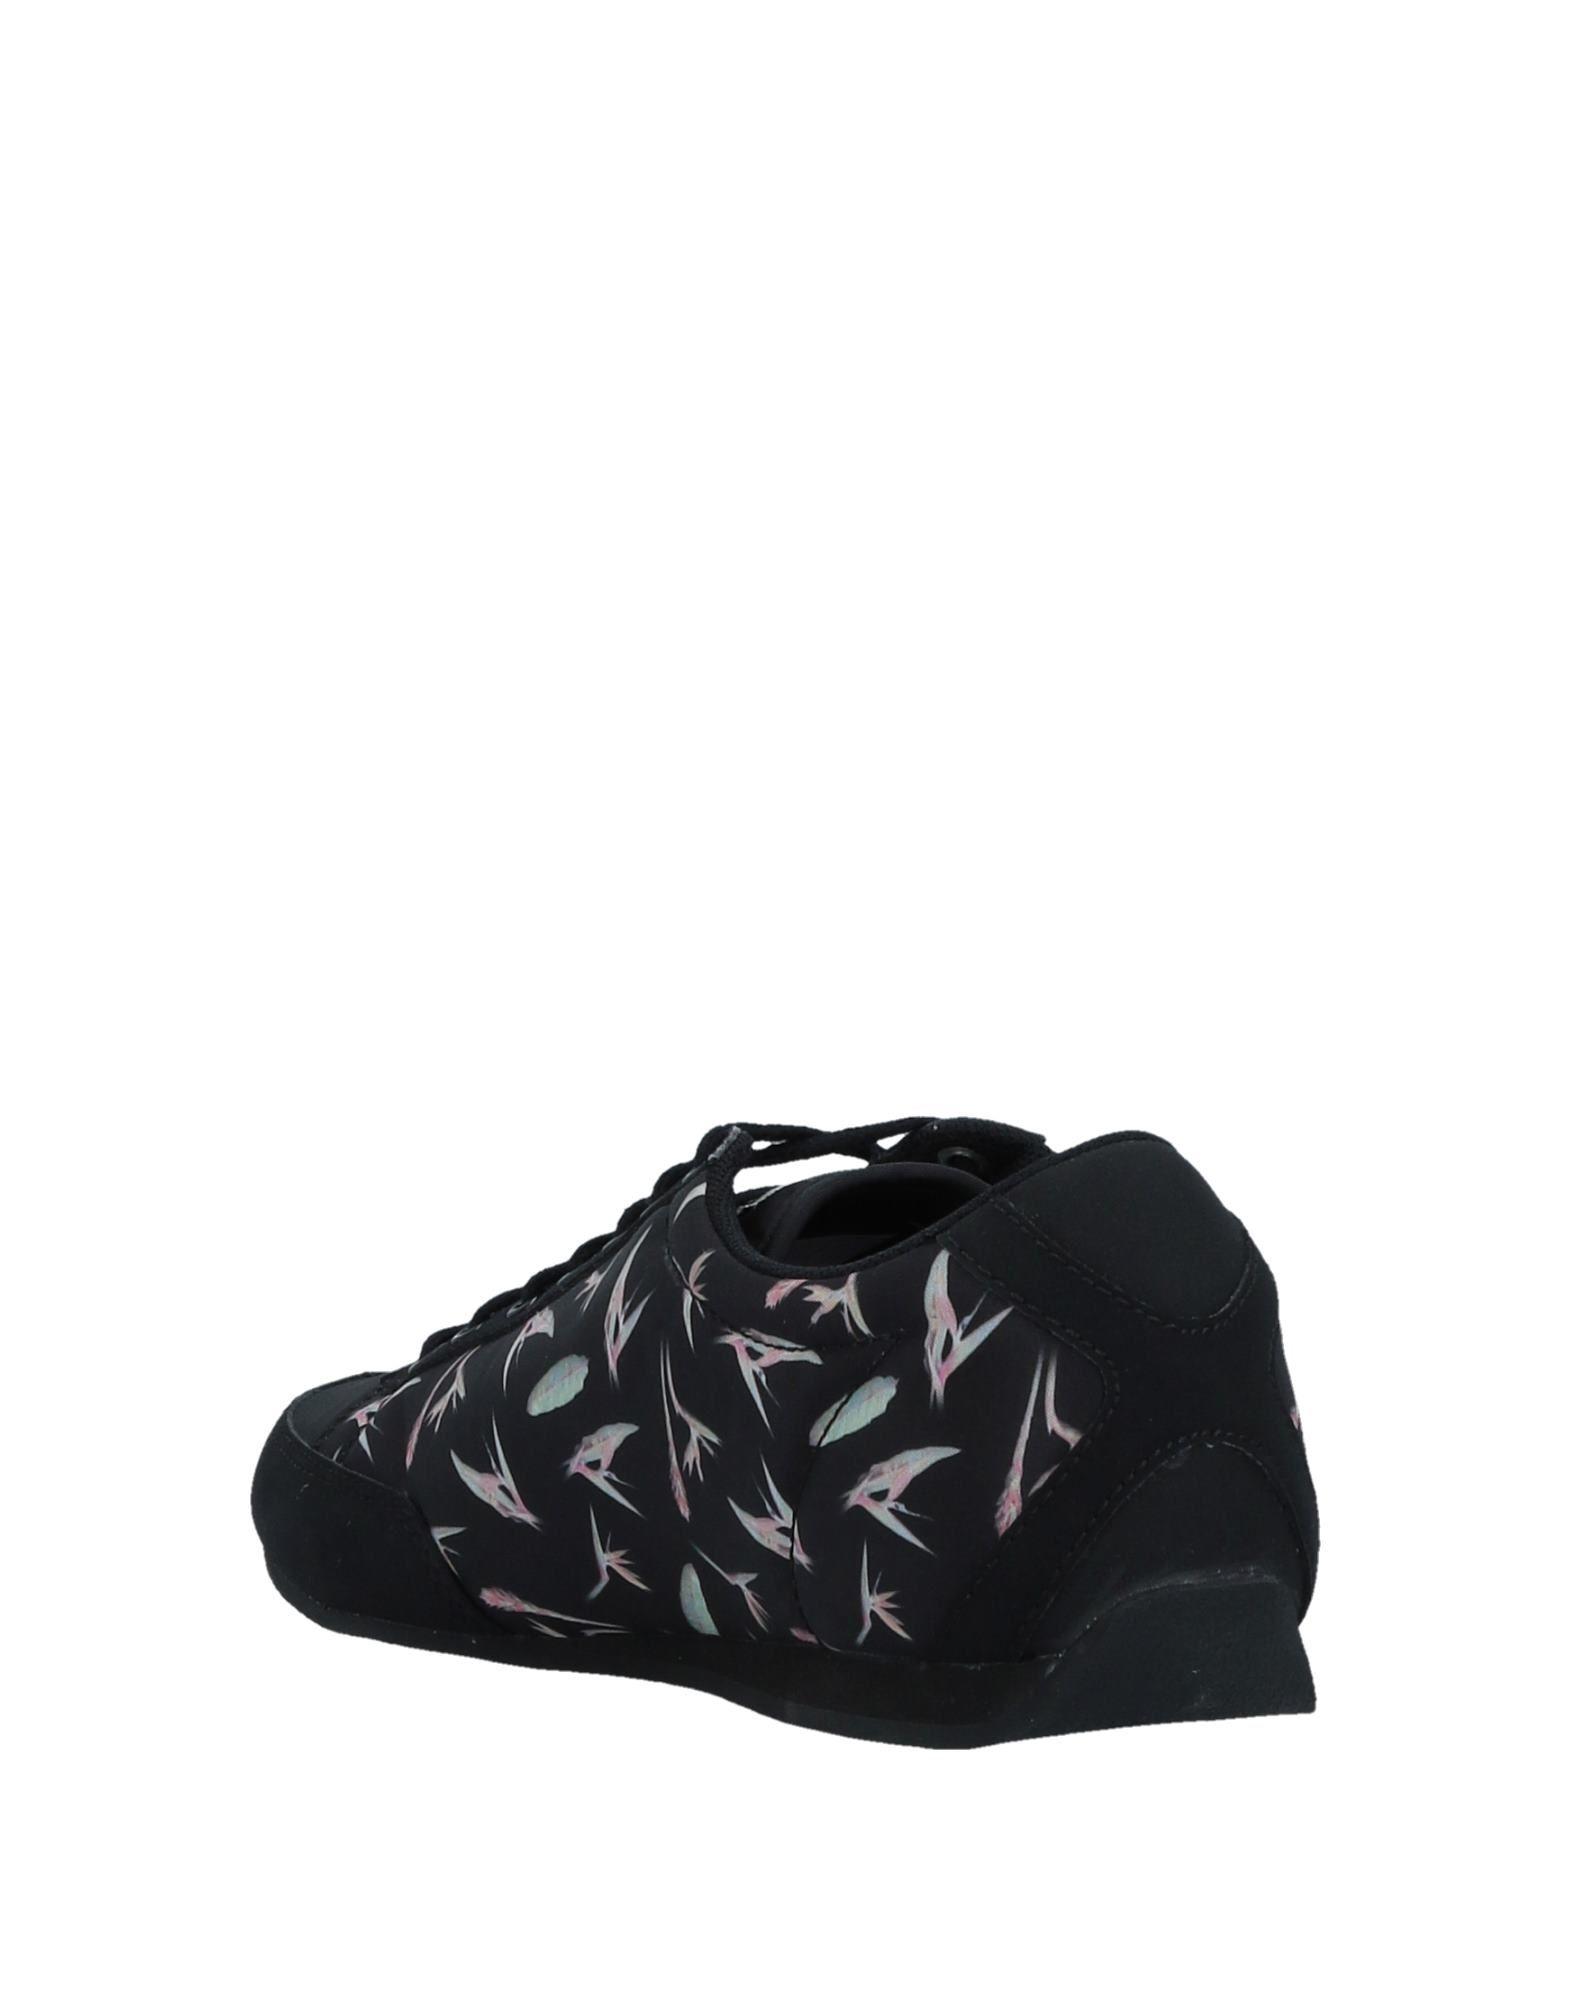 Le Coq Sportif Sneakers Damen  11518324LK Gute Qualität beliebte Schuhe